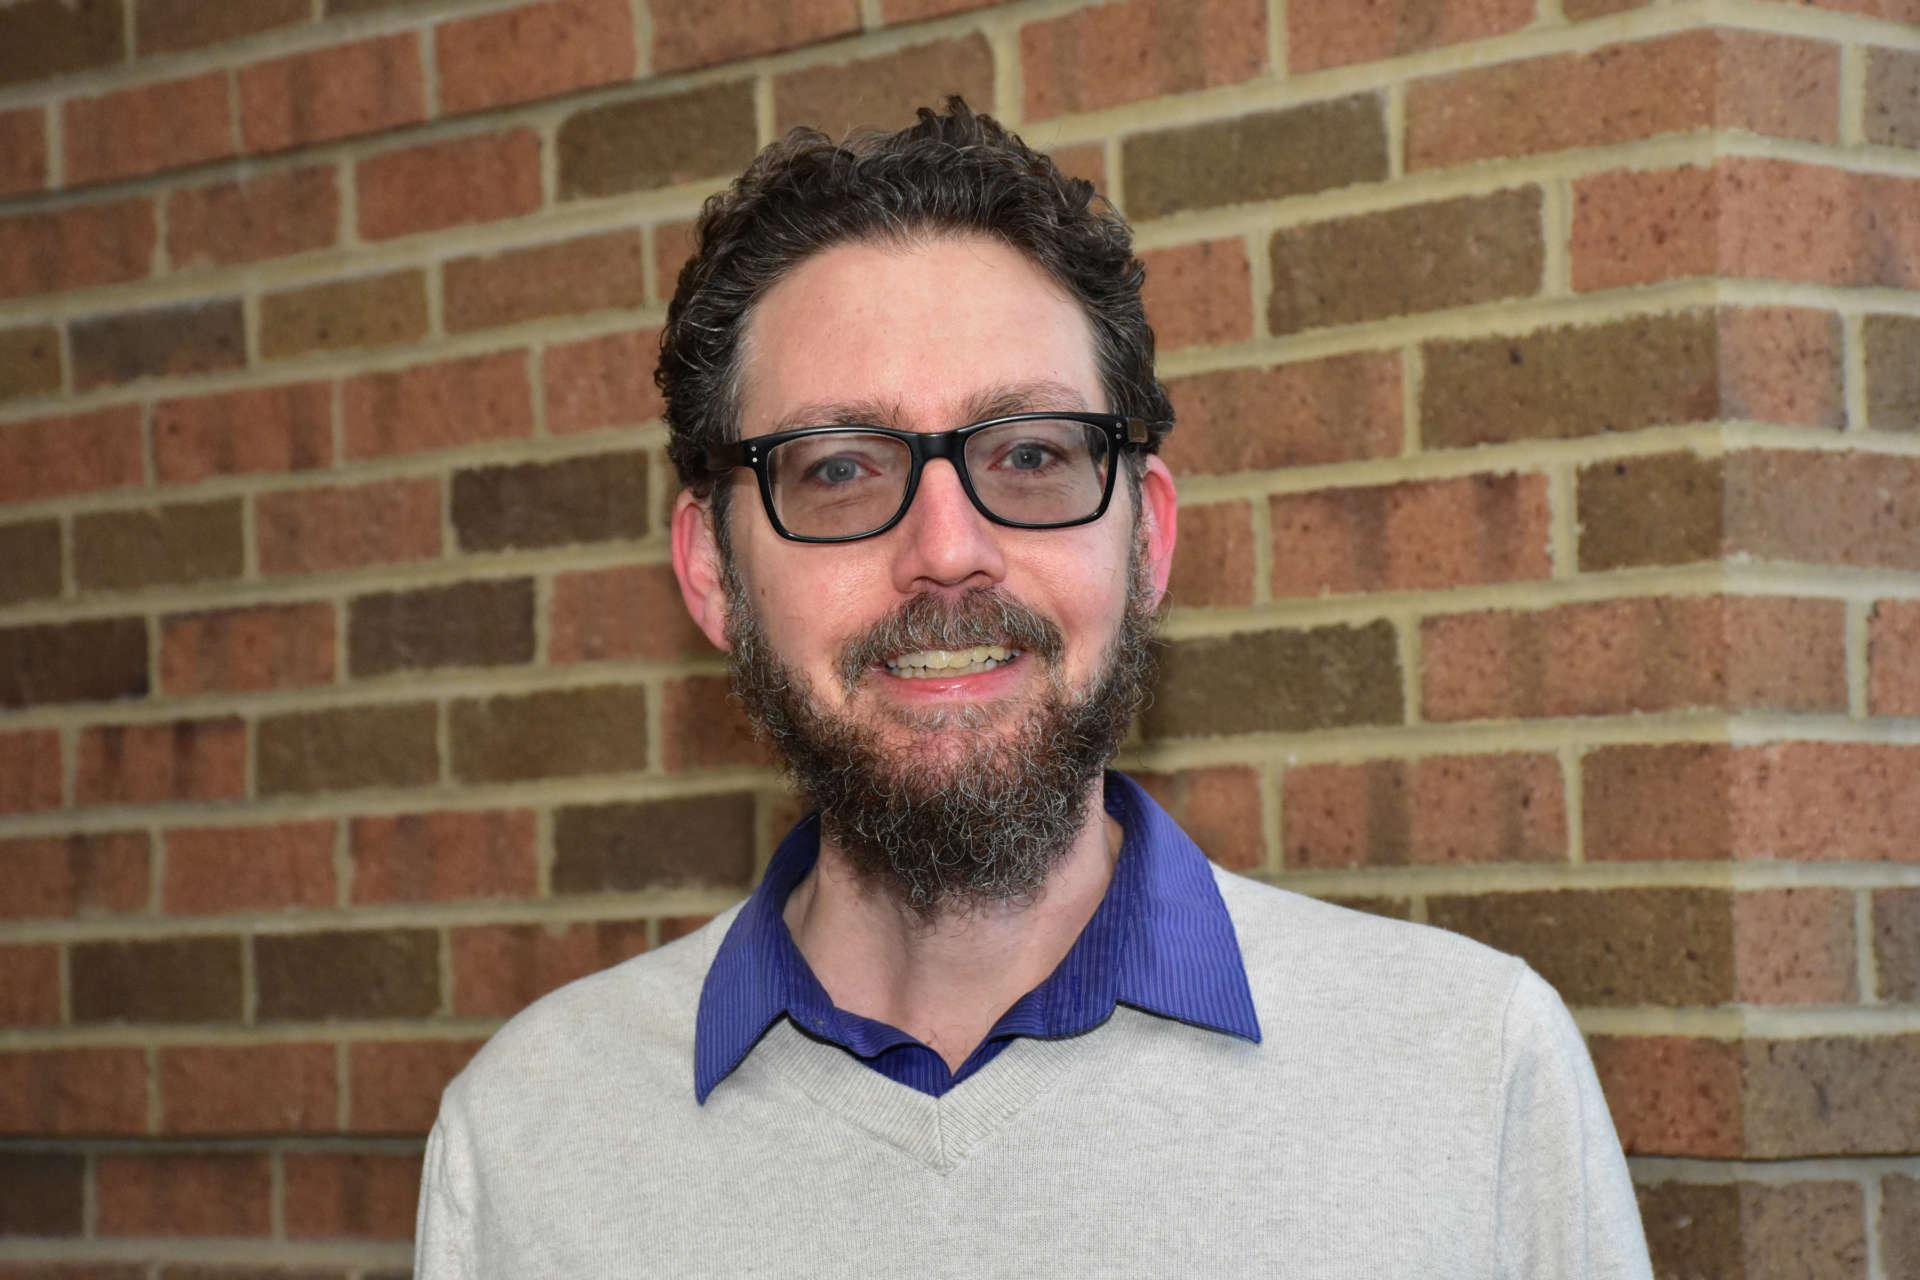 Dr. James Pate, associate professor of English